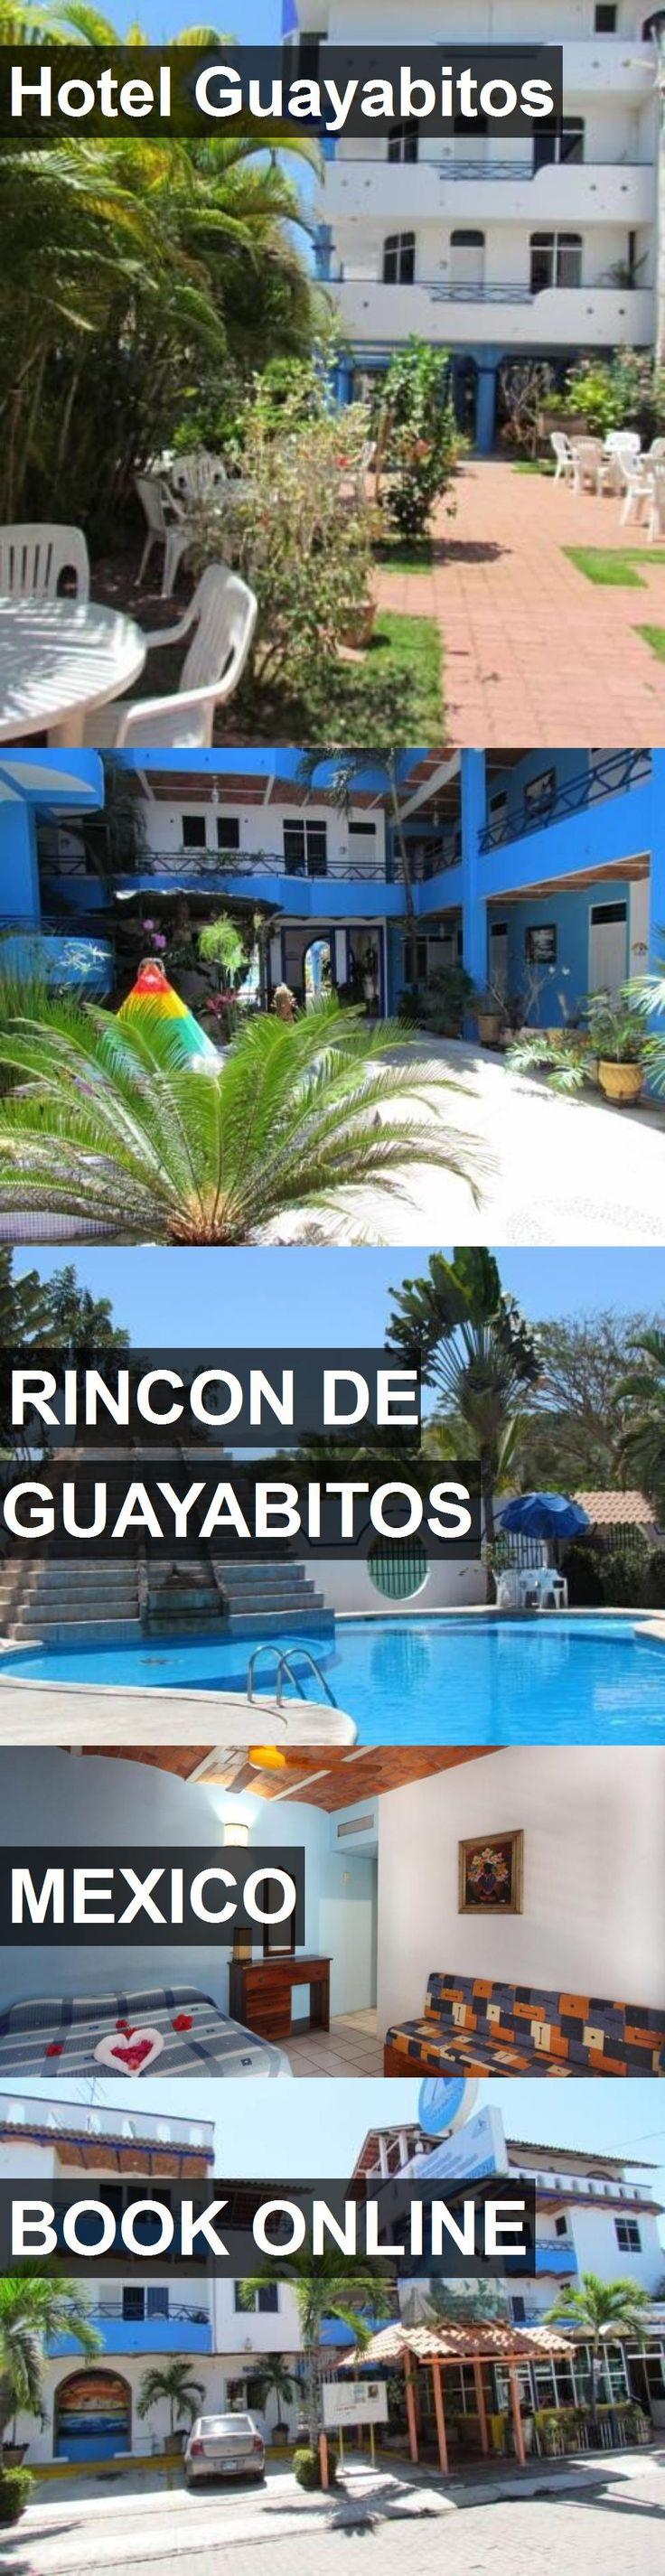 Hotel Guayabitos in Rincon de Guayabitos, Mexico. For more information, photos, reviews and best prices please follow the link. #Mexico #RincondeGuayabitos #travel #vacation #hotel